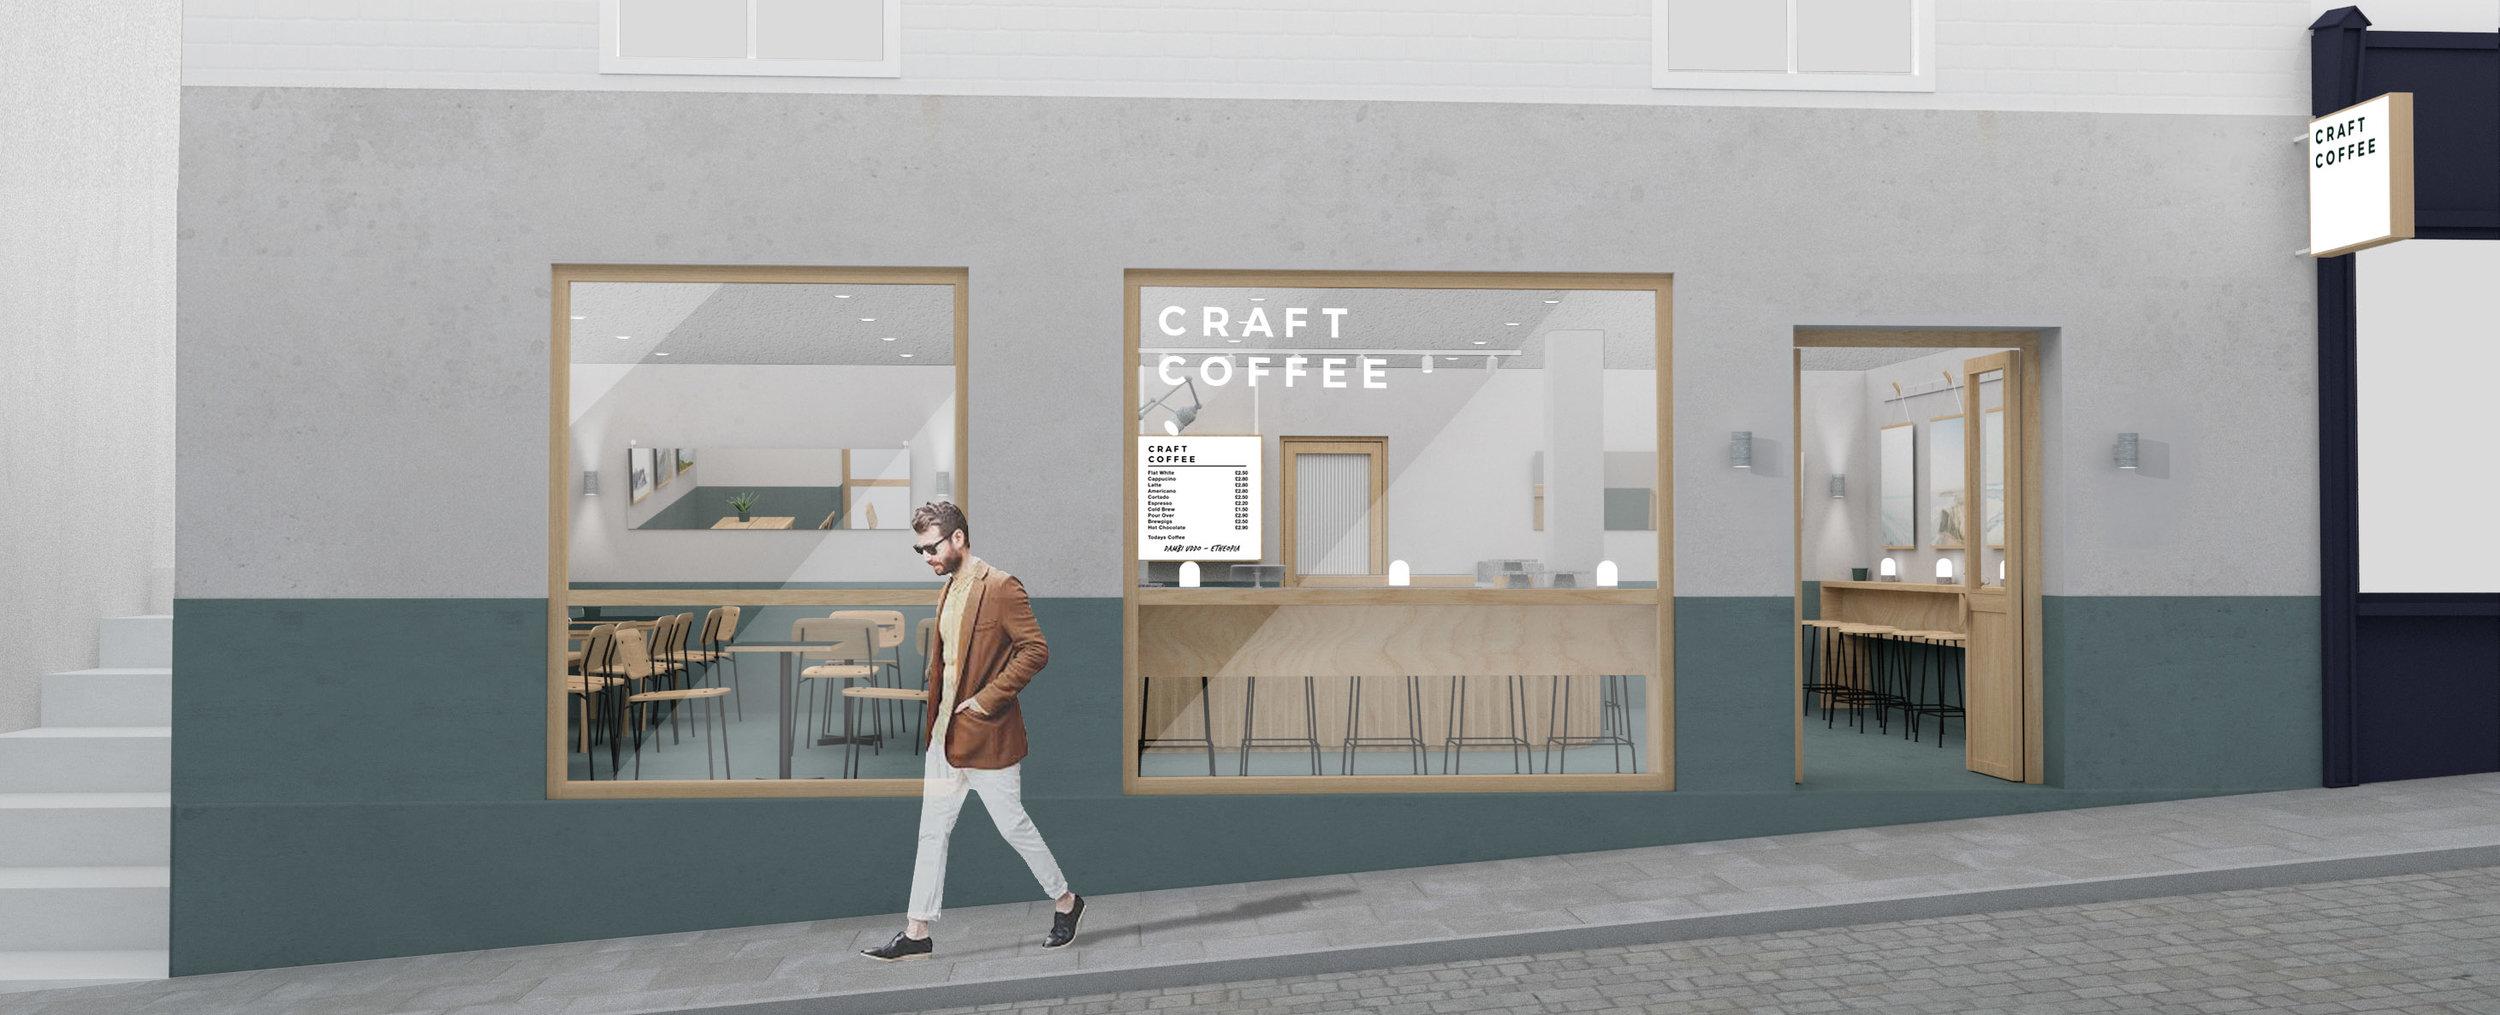 lunarlunar_interior_design_cafe_craft_coffee_banquette_hastings_front.jpg